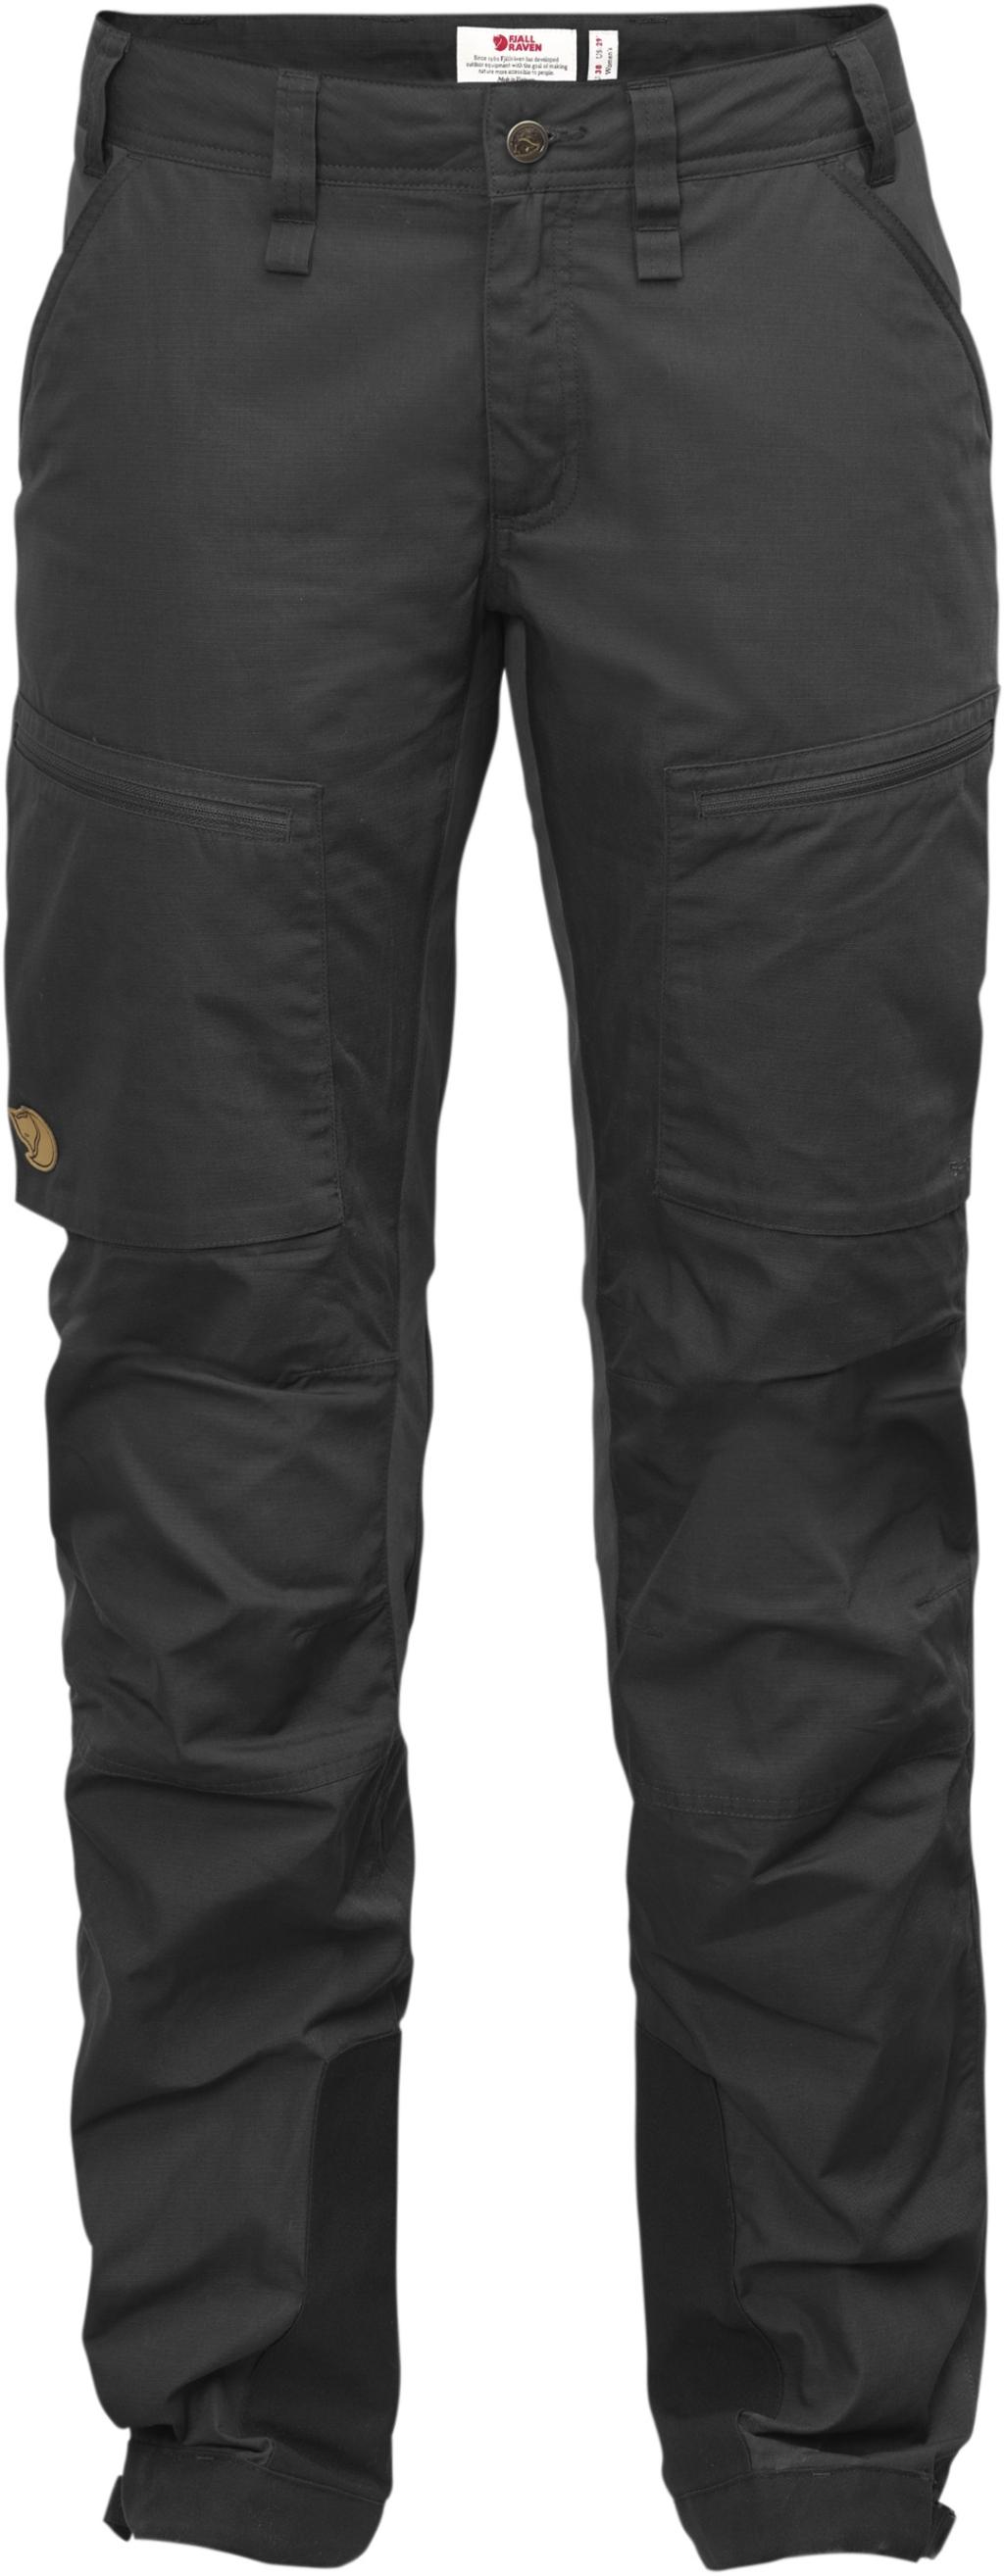 FjallRaven Abisko Lite Trekking Trousers W Dark Grey-30